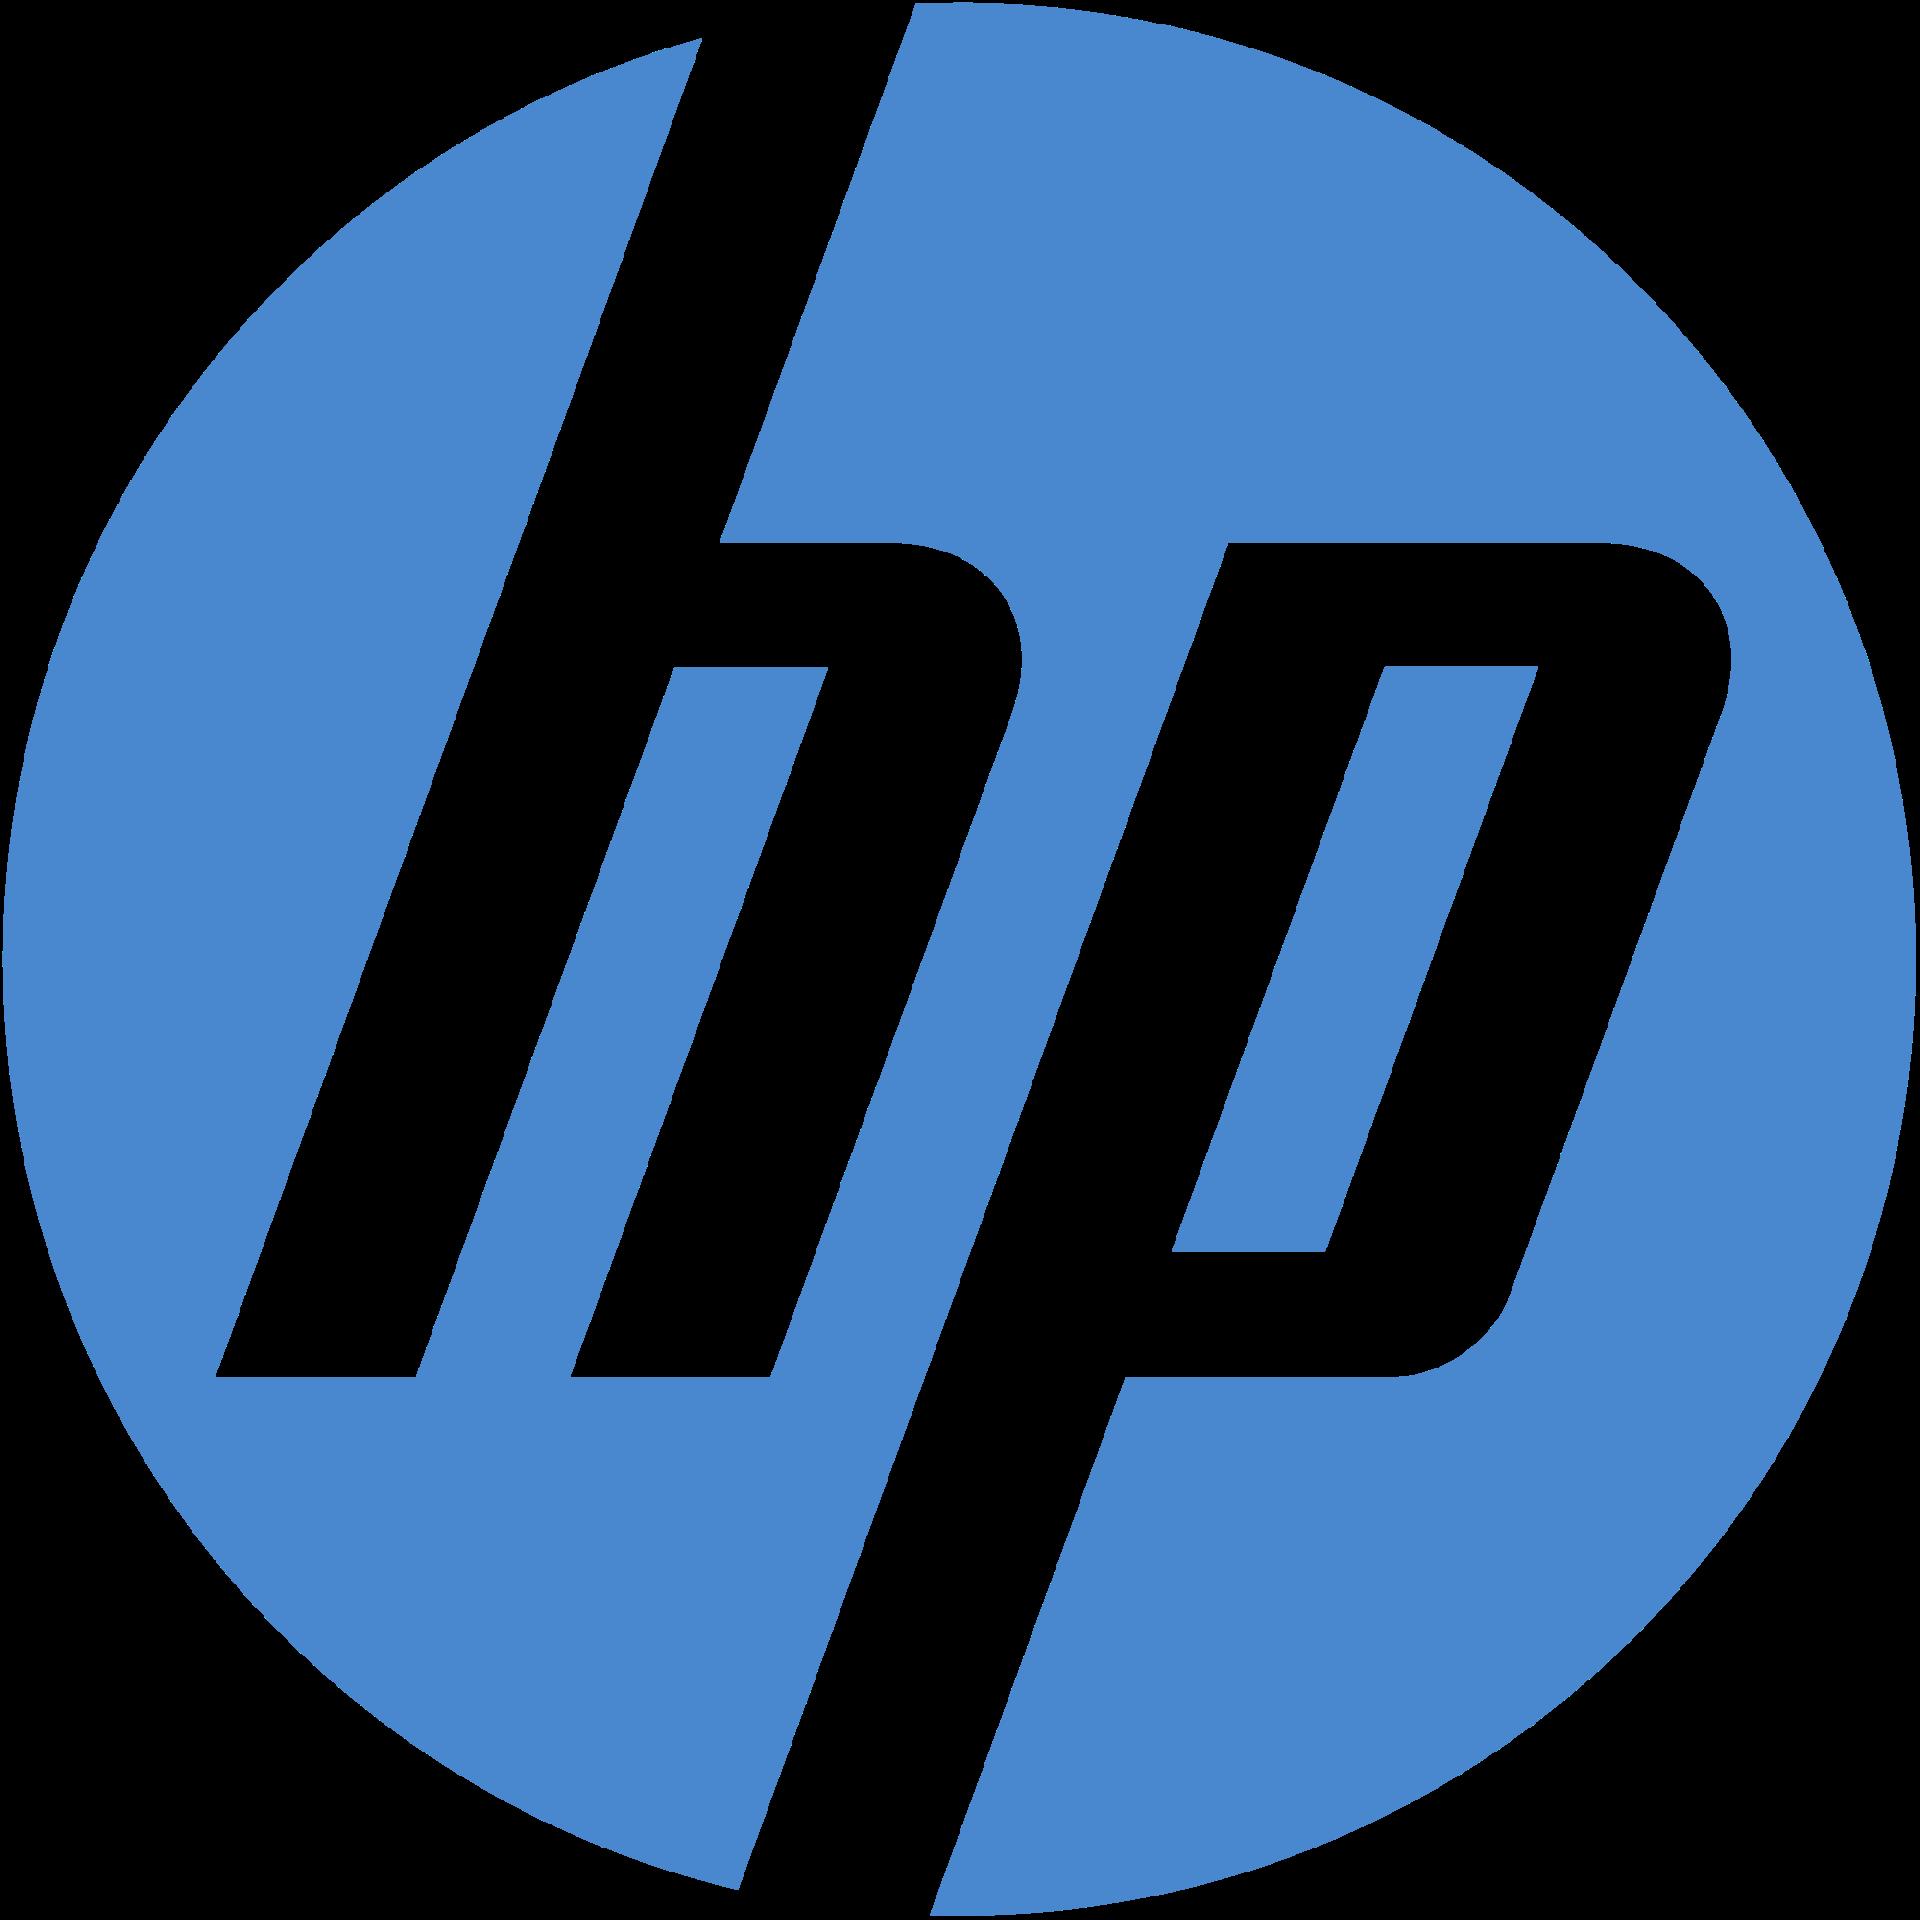 Gamco Investors INC. ET AL Decreases Stake in HP Inc. (HPQ)